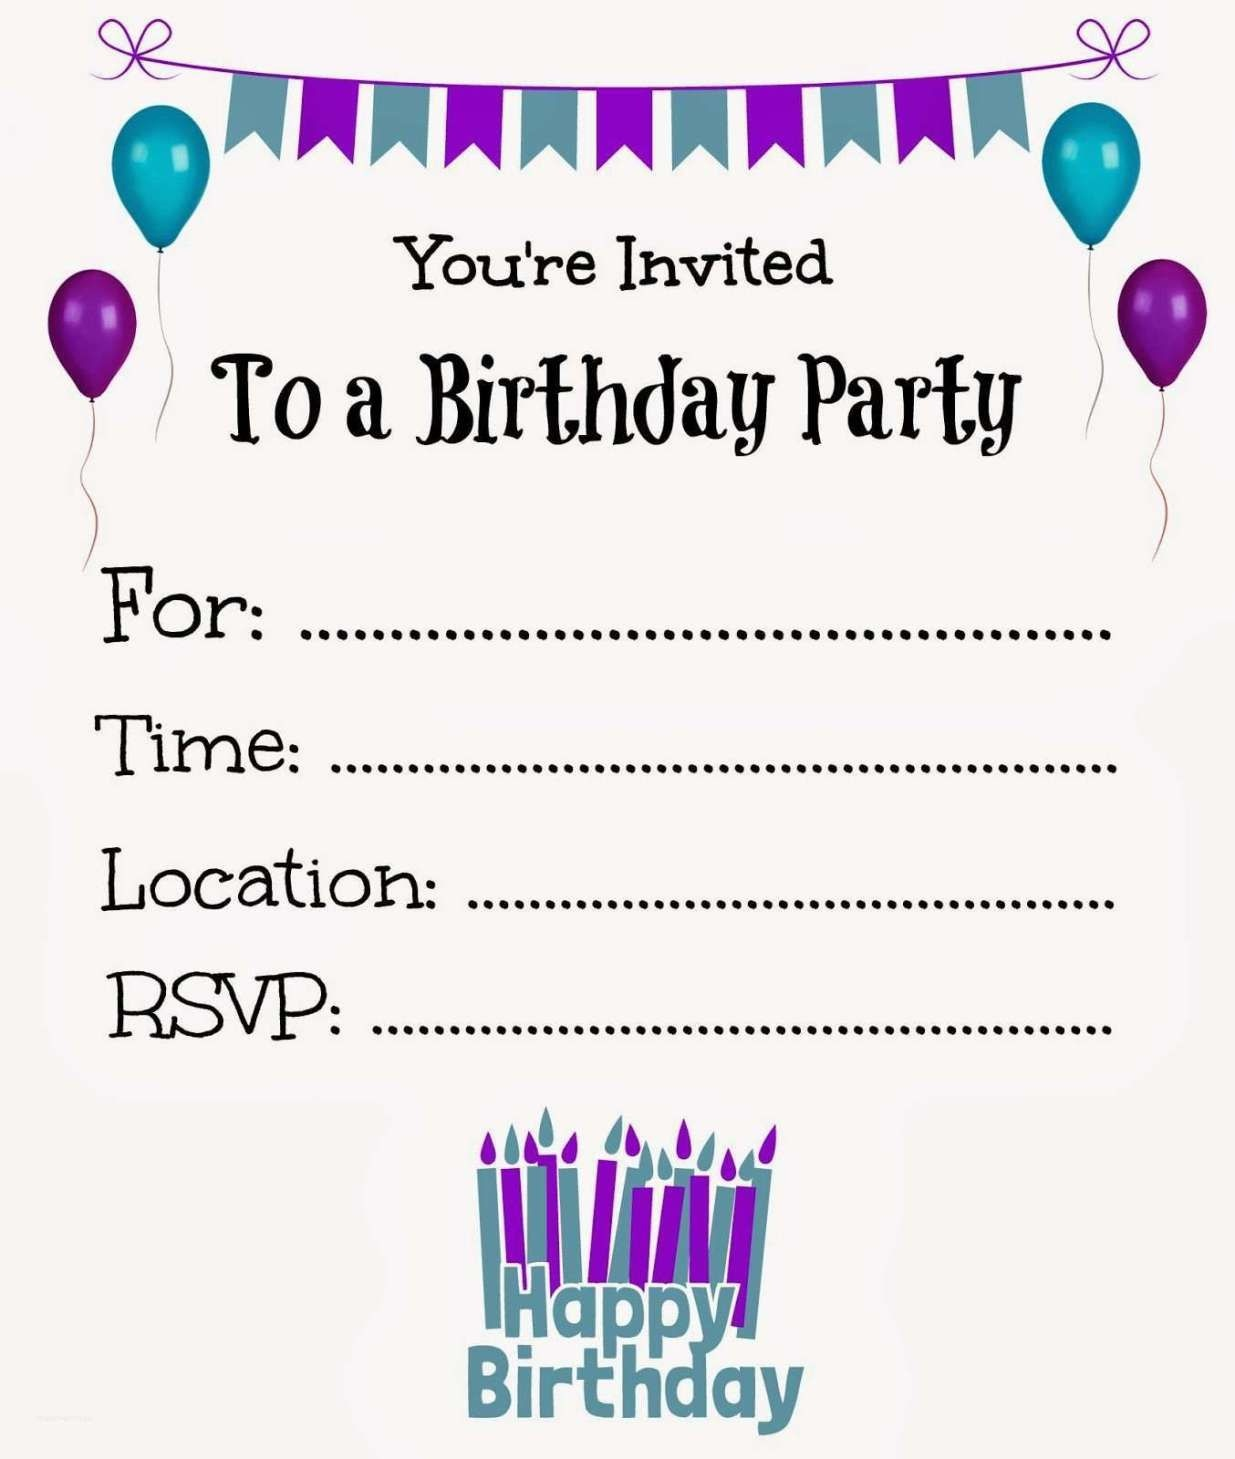 New Free Online Printable Birthday Party Invitations | Online - Birthday Party Invitations Online Free Printable